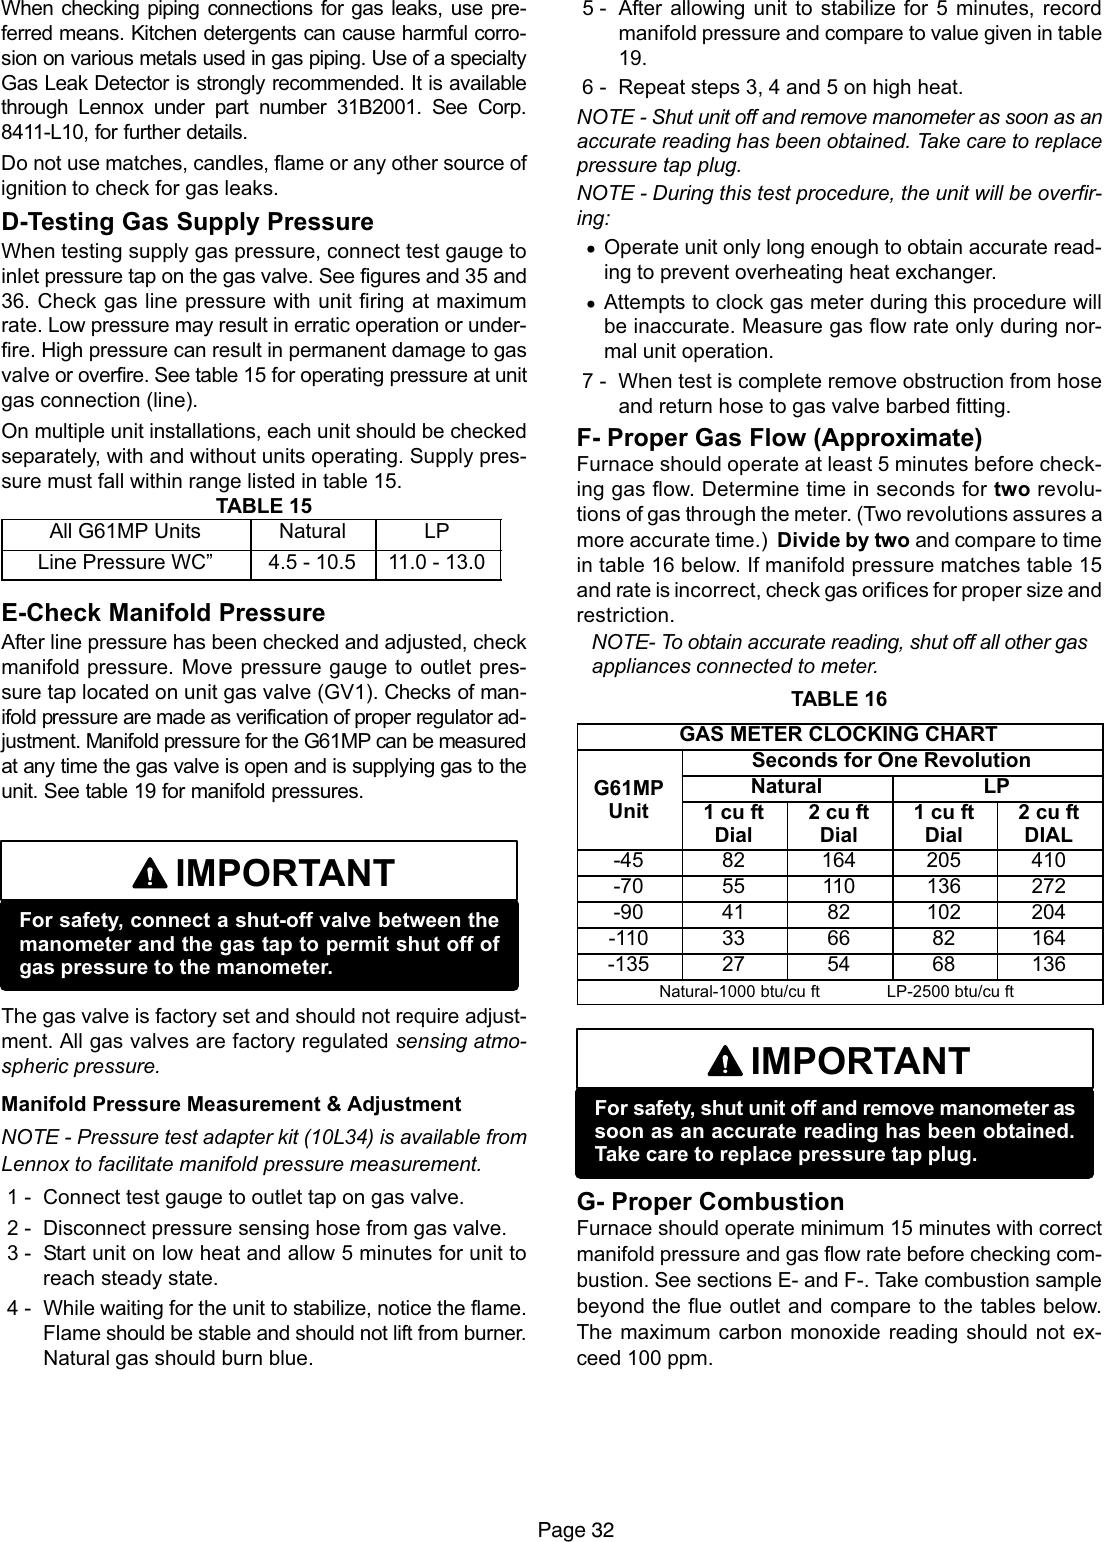 Lennox International Inc Unit G61Mp Users Manual 0308c